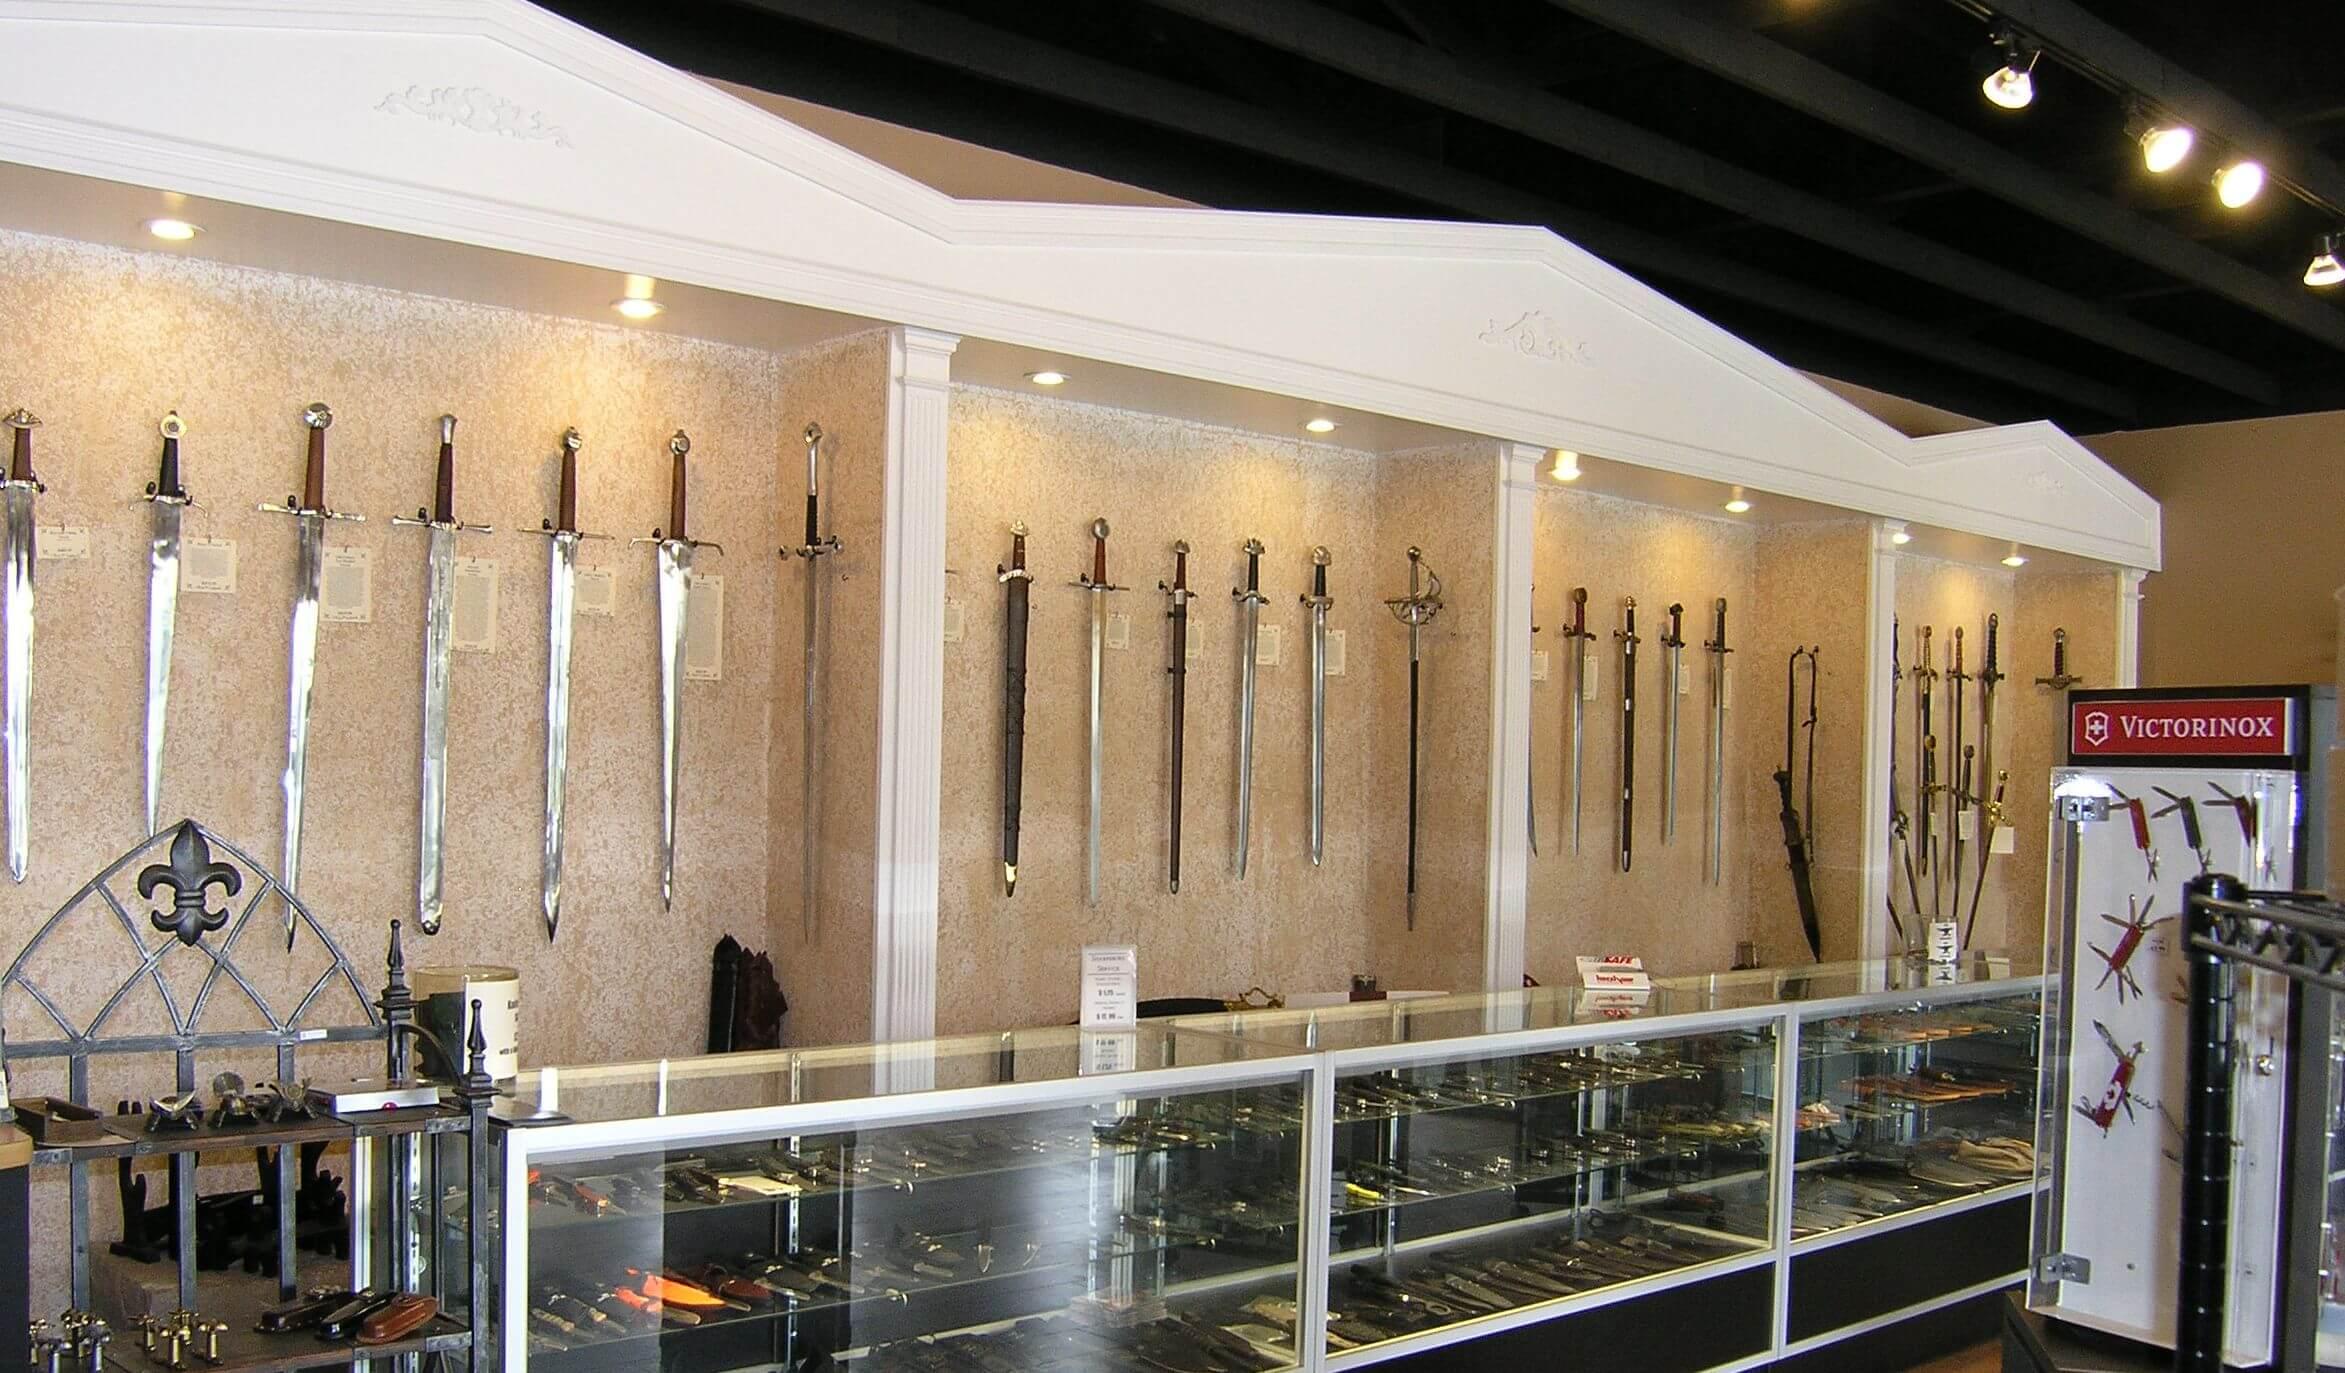 London Ontario Sword Store